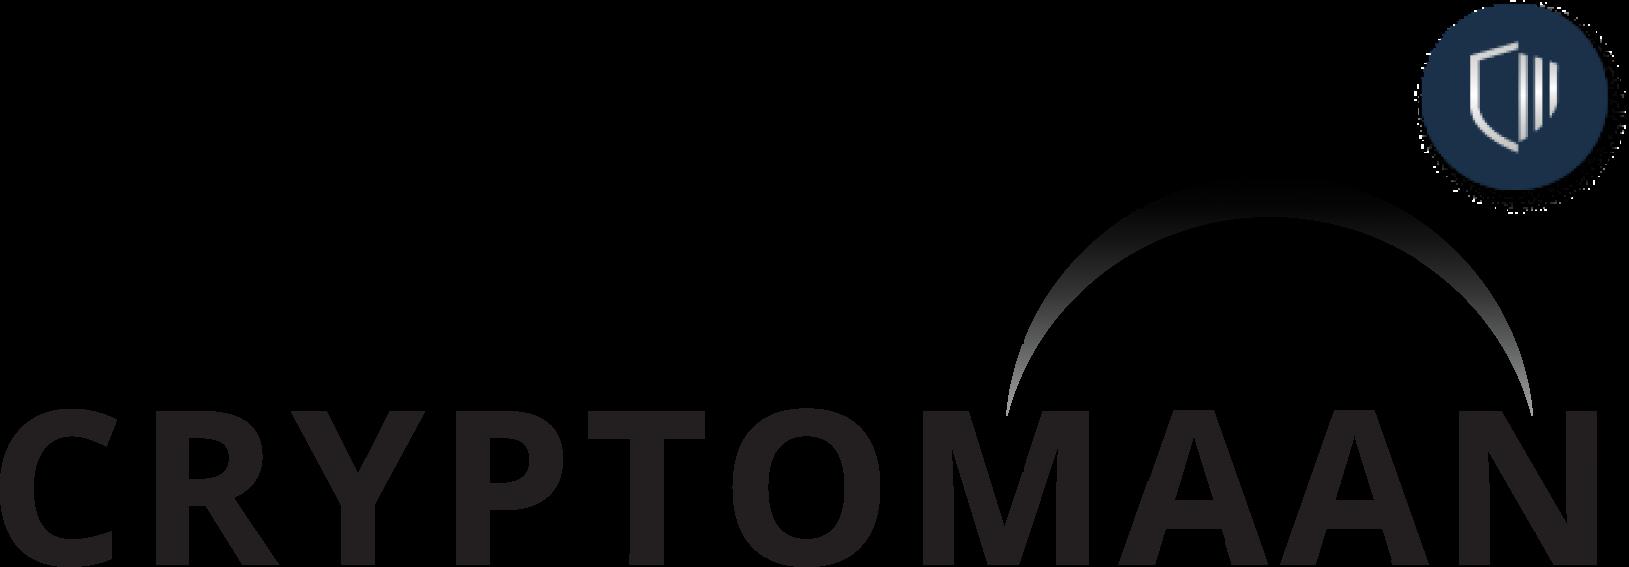 CRYPTOMAAN - CoolWallet Retailer